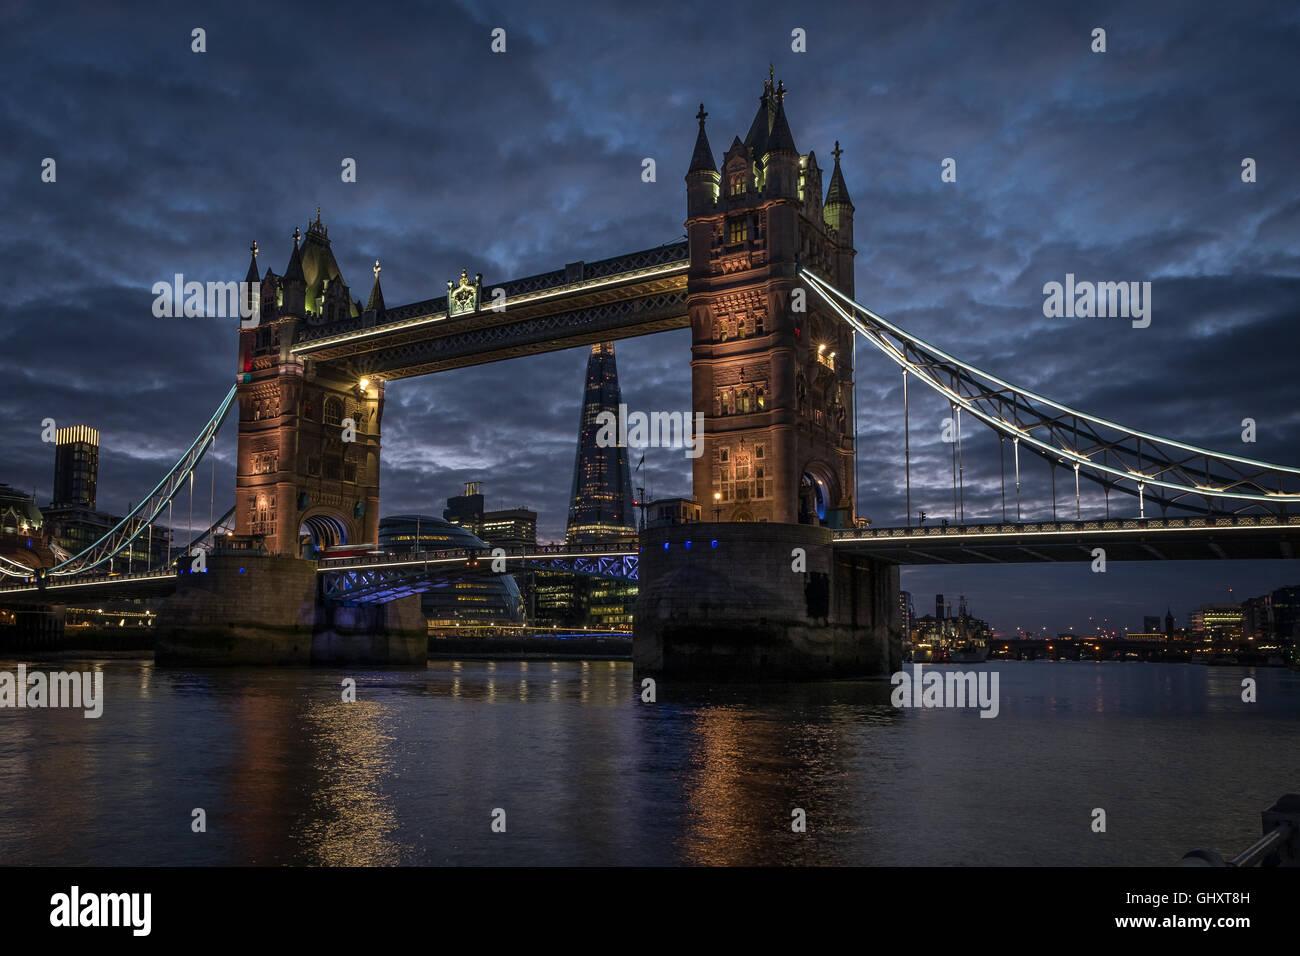 Tower Bridge London at night - Stock Image